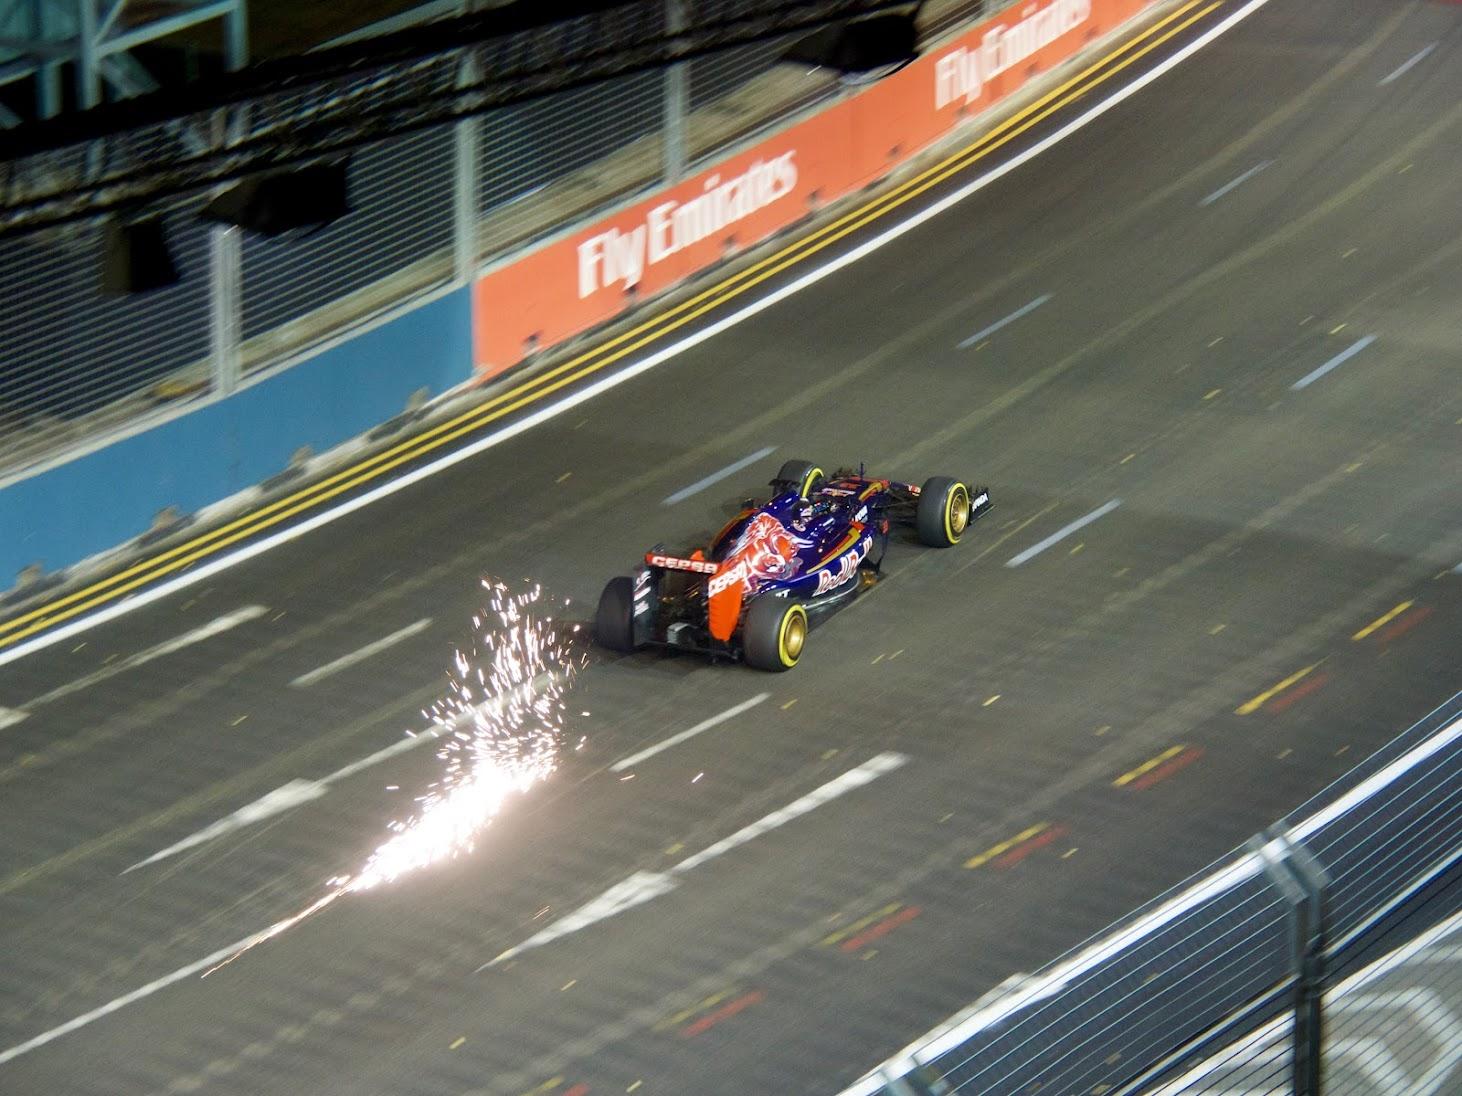 Singapore GP 2015 Practice 2